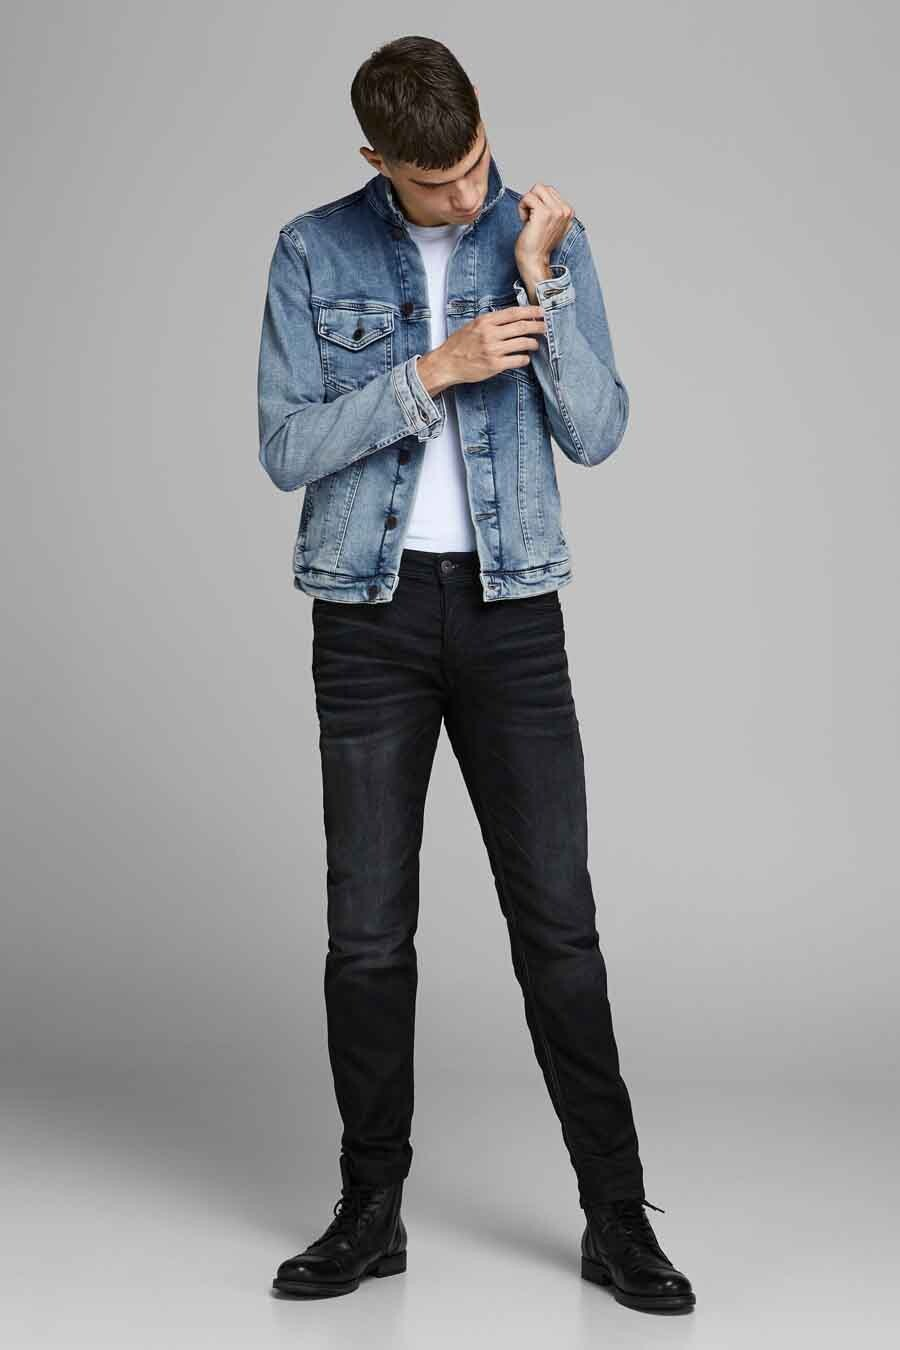 Jack & Jones Jeans Intelligence Jas kort, Denim, Heren, Maat: L/M